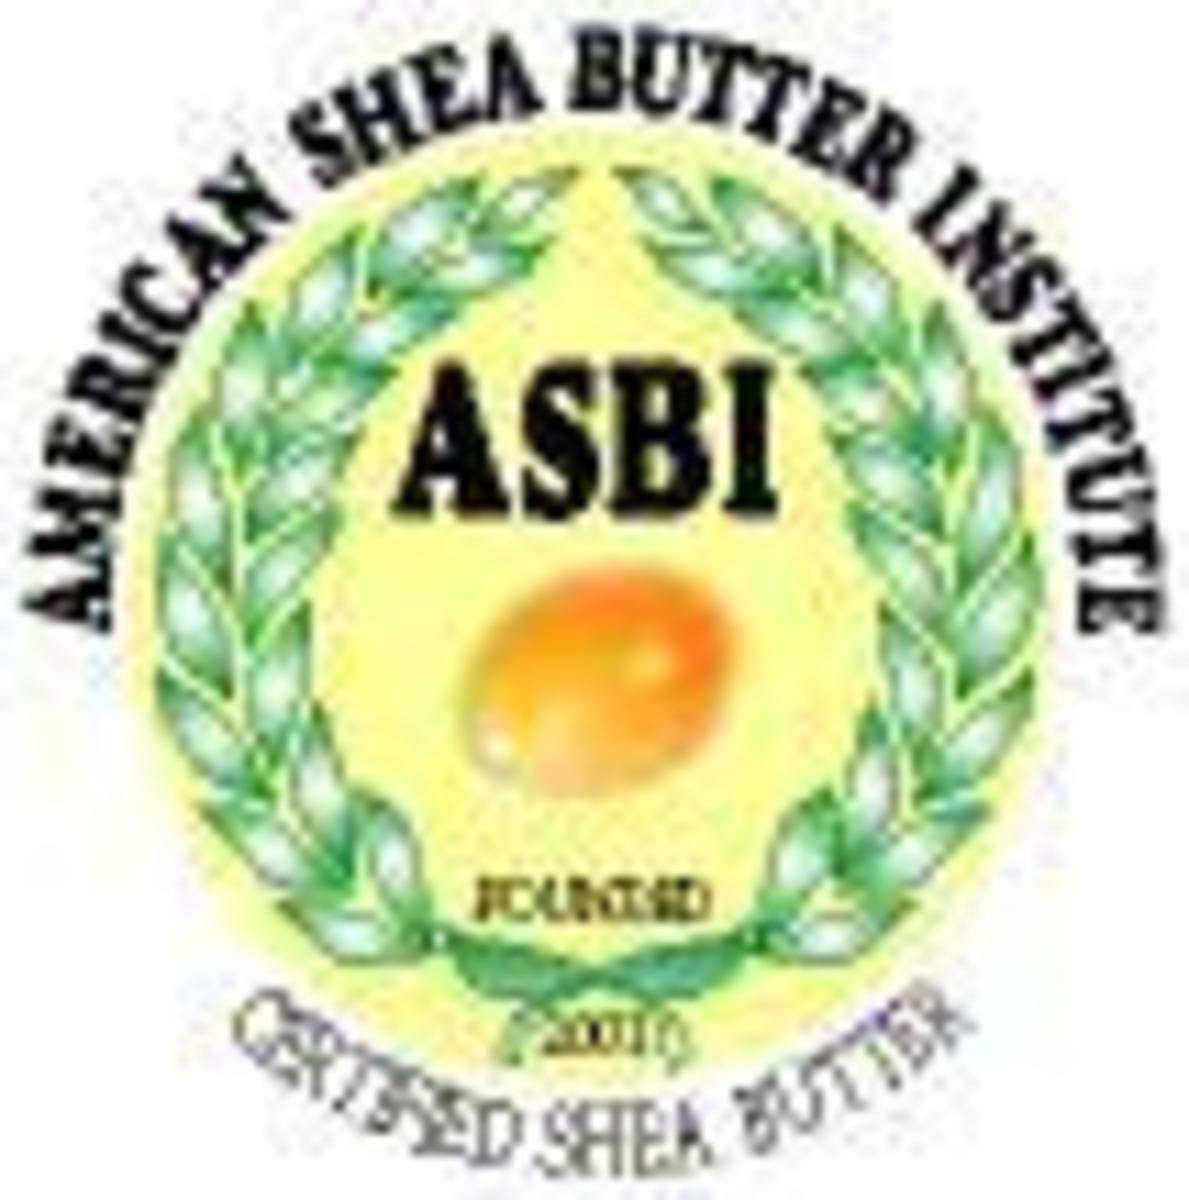 shea-butters-many-benefits